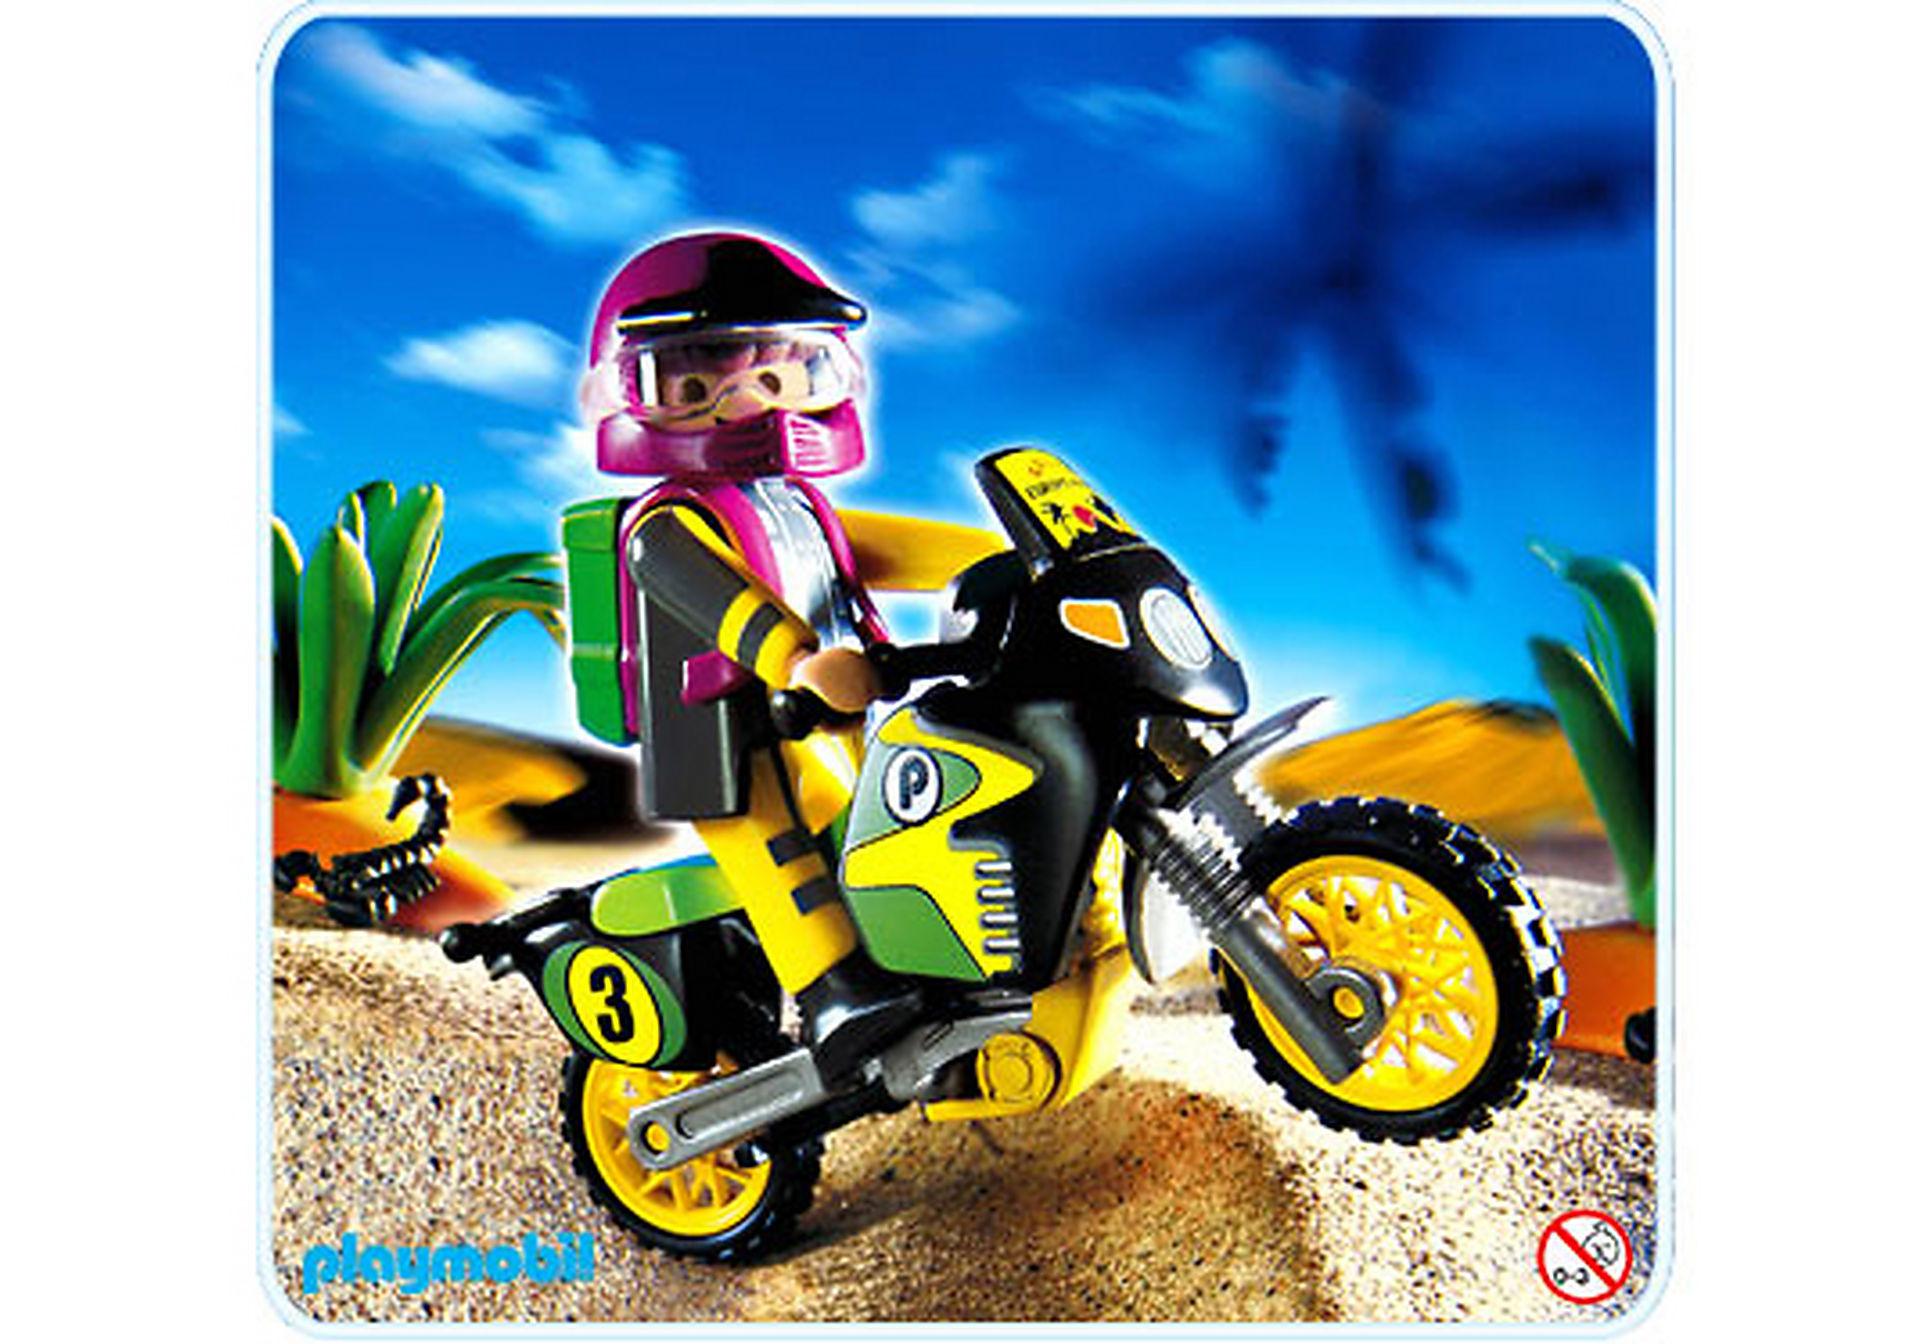 4426-A Rallye-Motorrad zoom image1